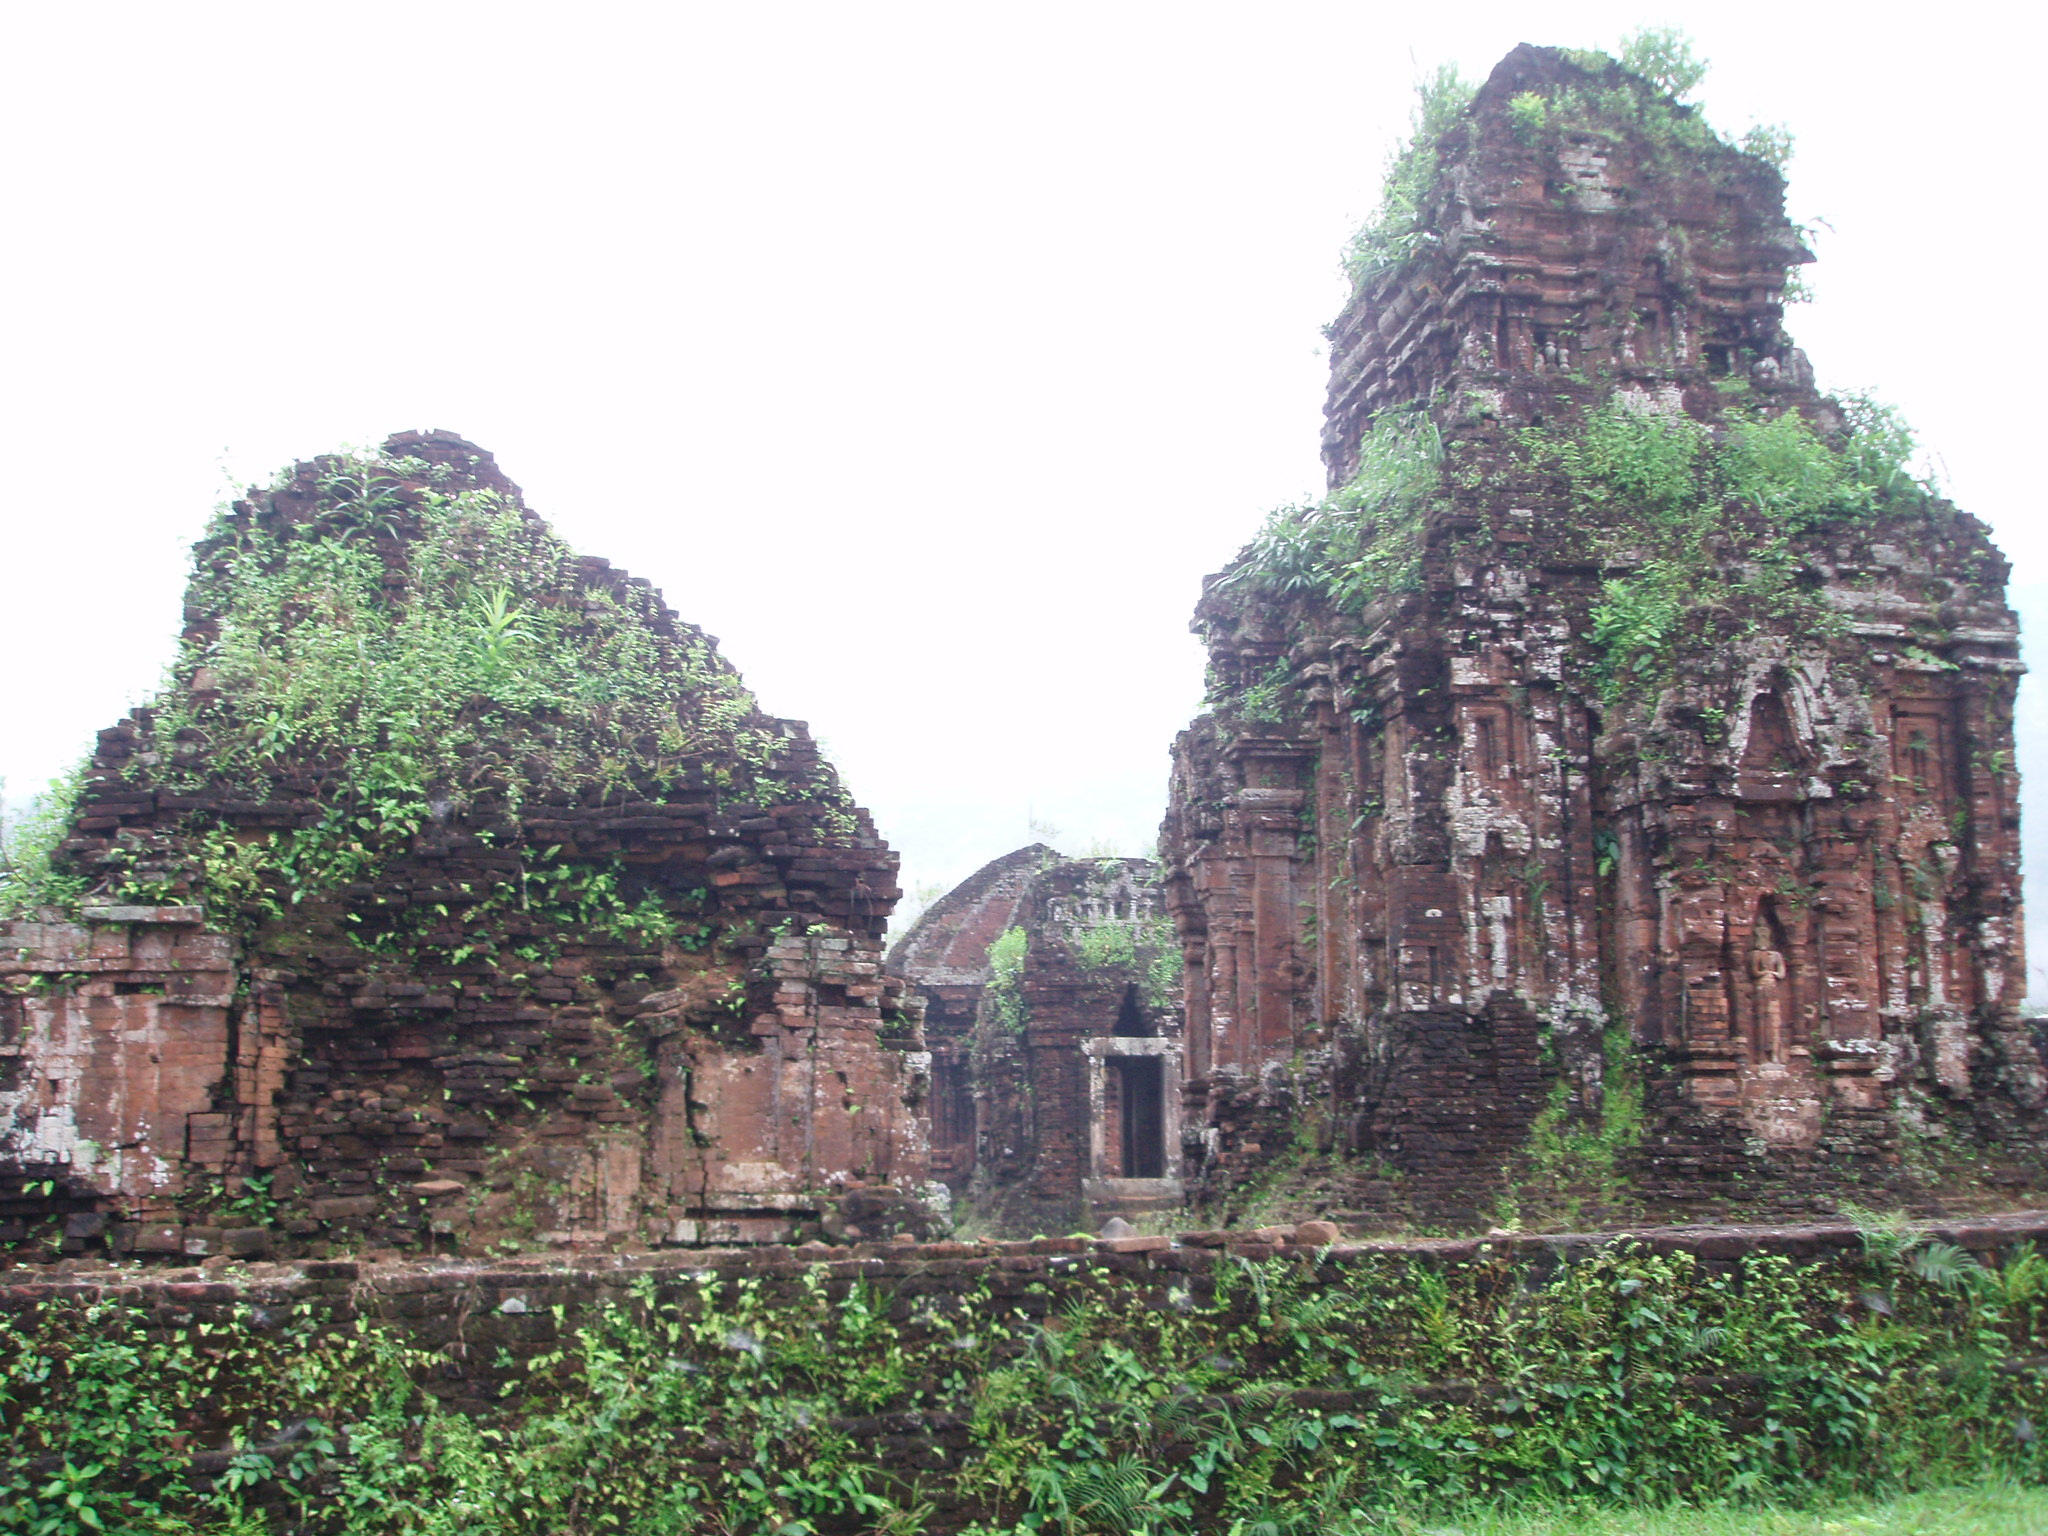 File:Ruins of my son vietnam.jpg - Wikimedia Commons